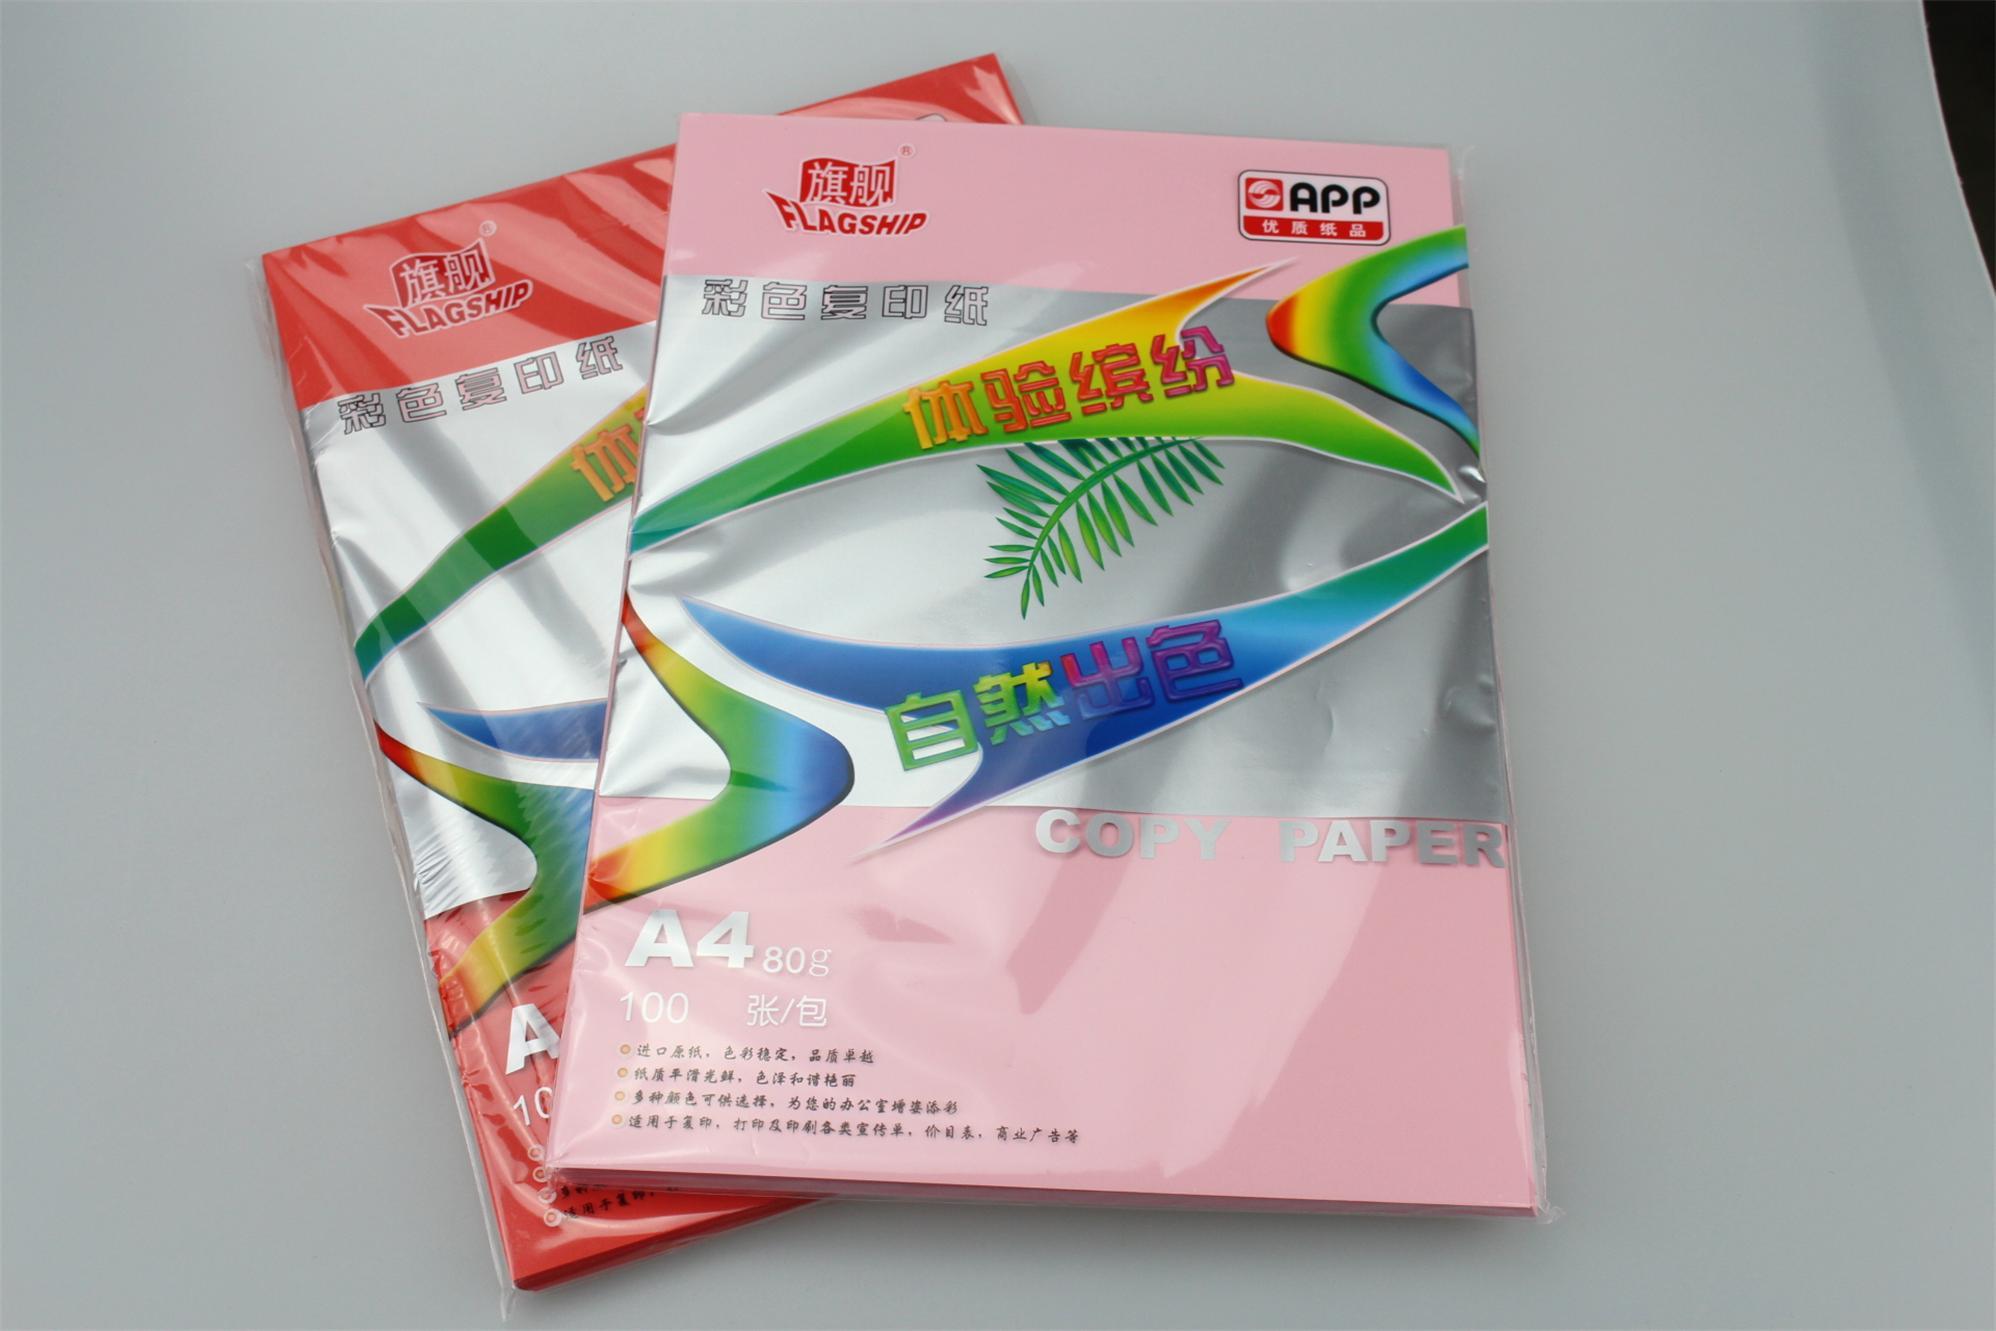 Usd 6 47 Gold Flagship A4 Color Copy Paper 100 Pages 80g Yalong App